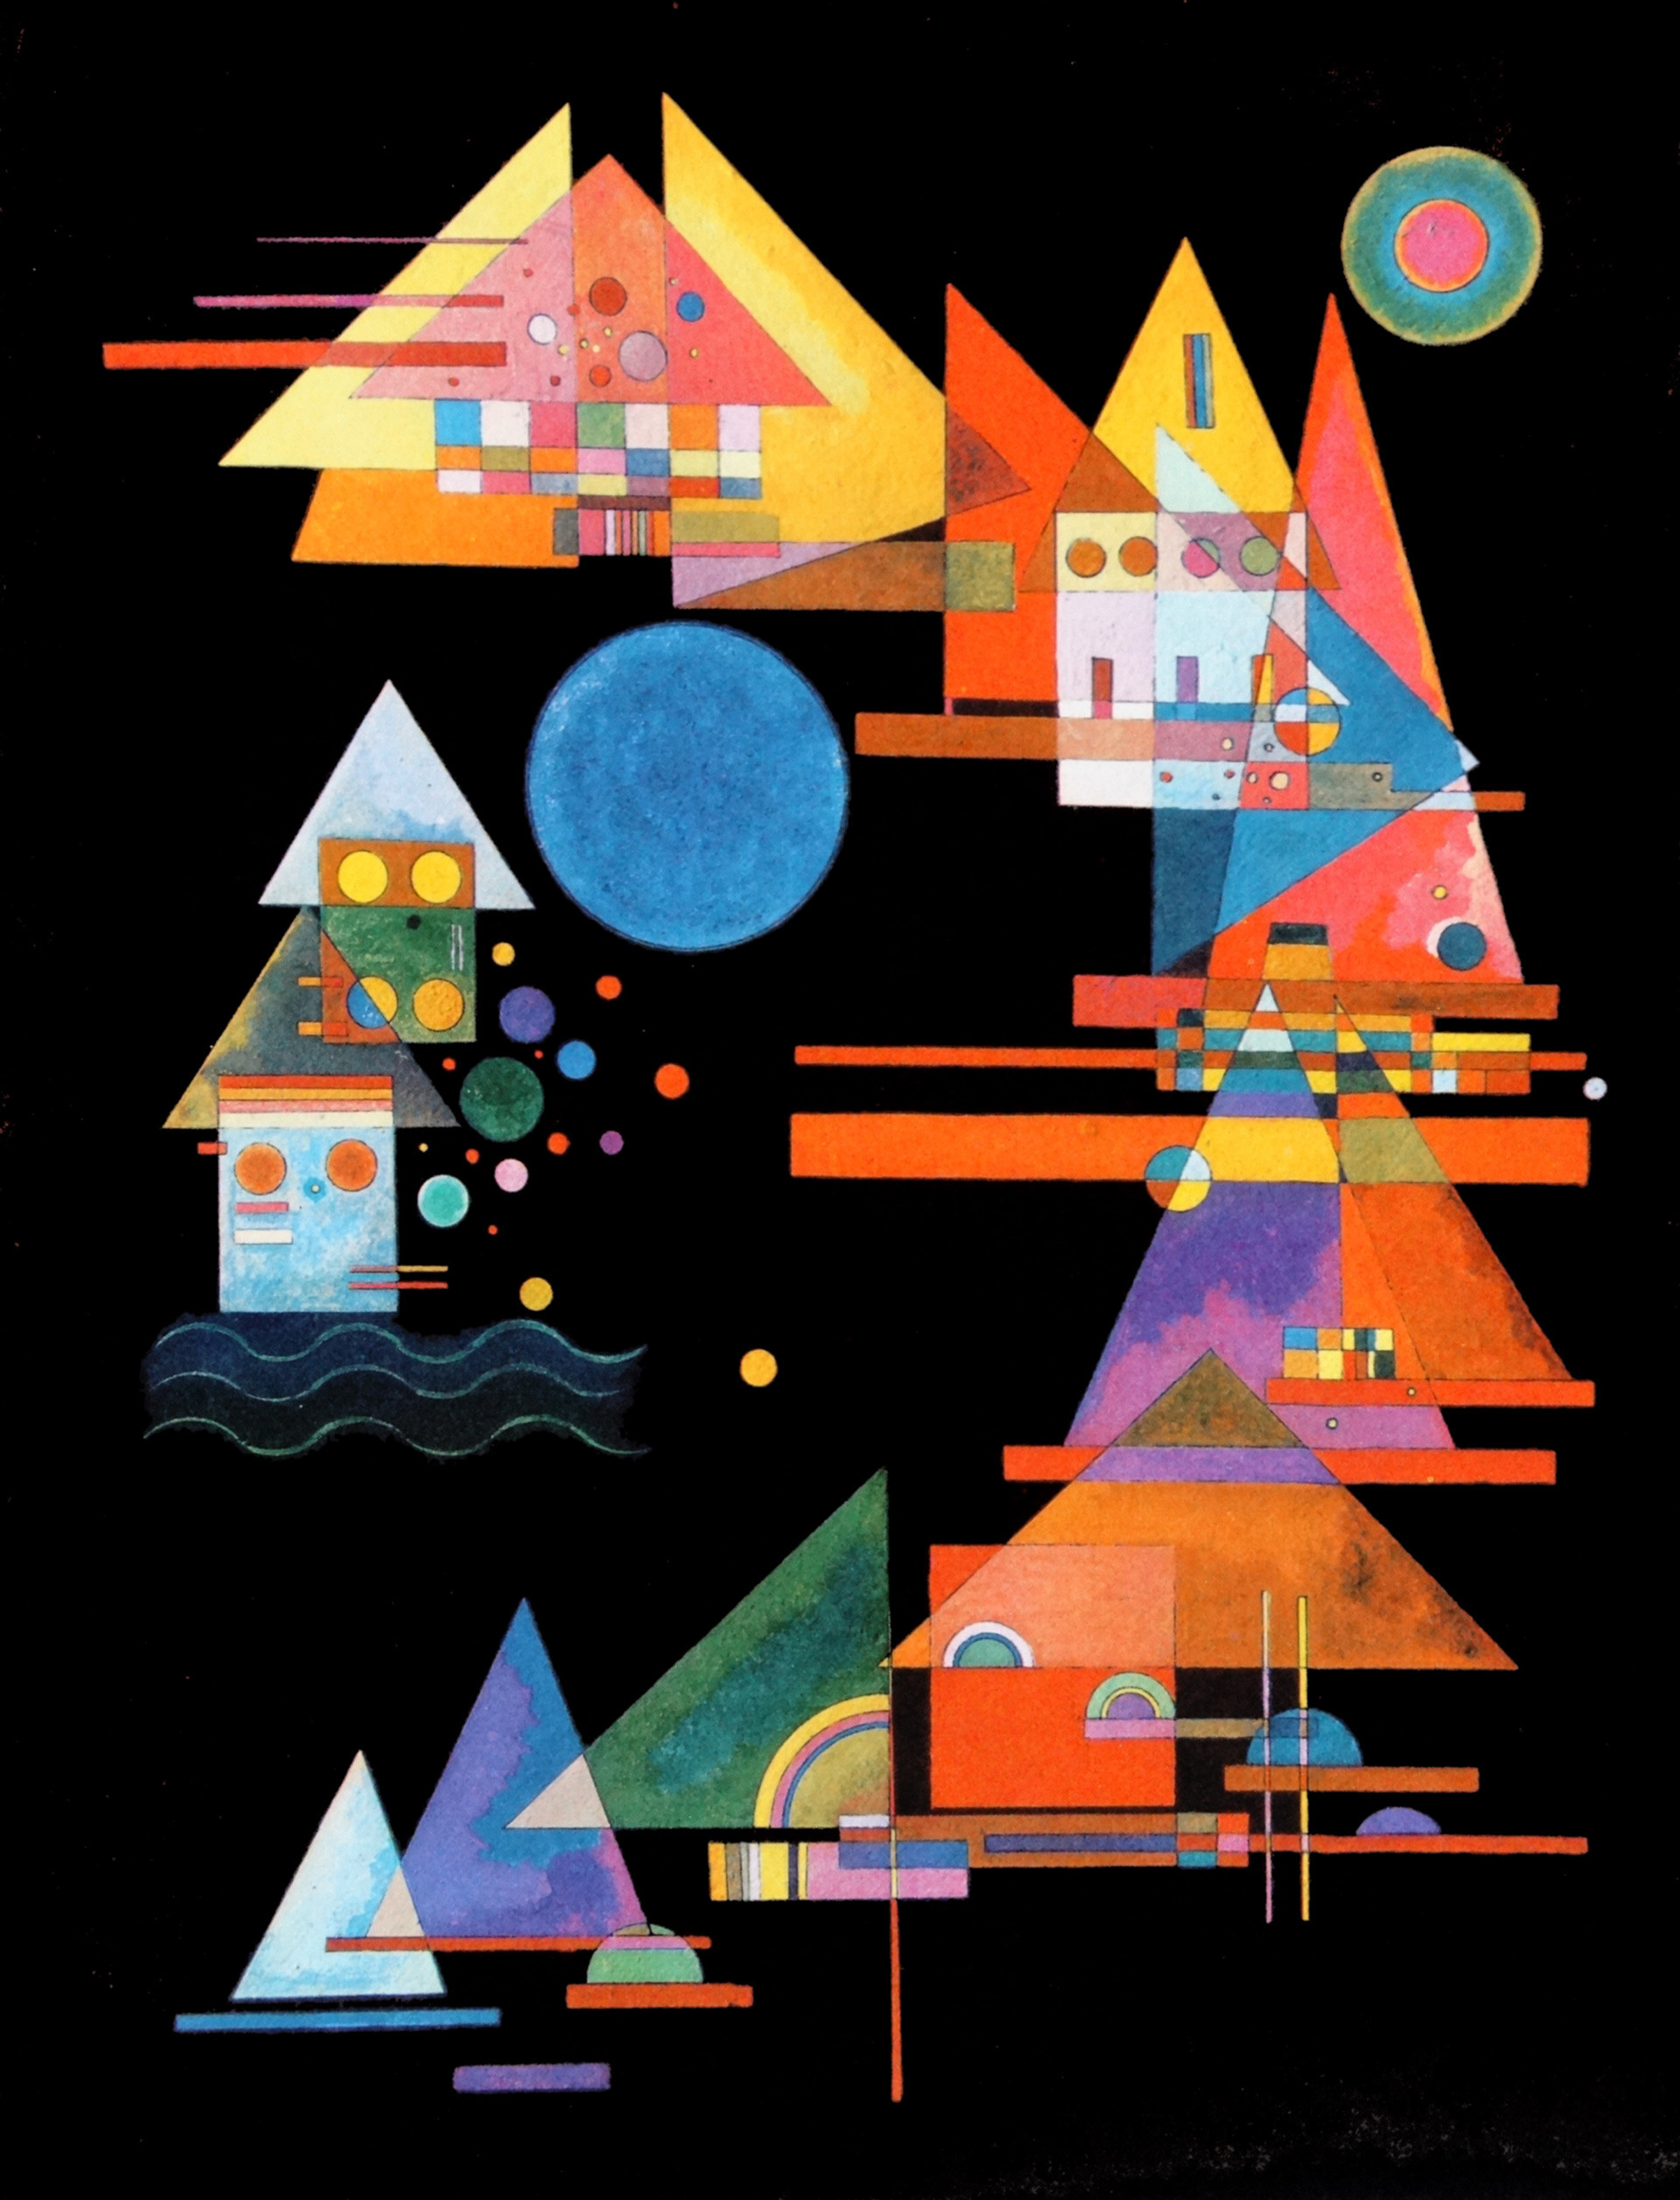 Triangles dans une courbe par Vassili Kandinsky